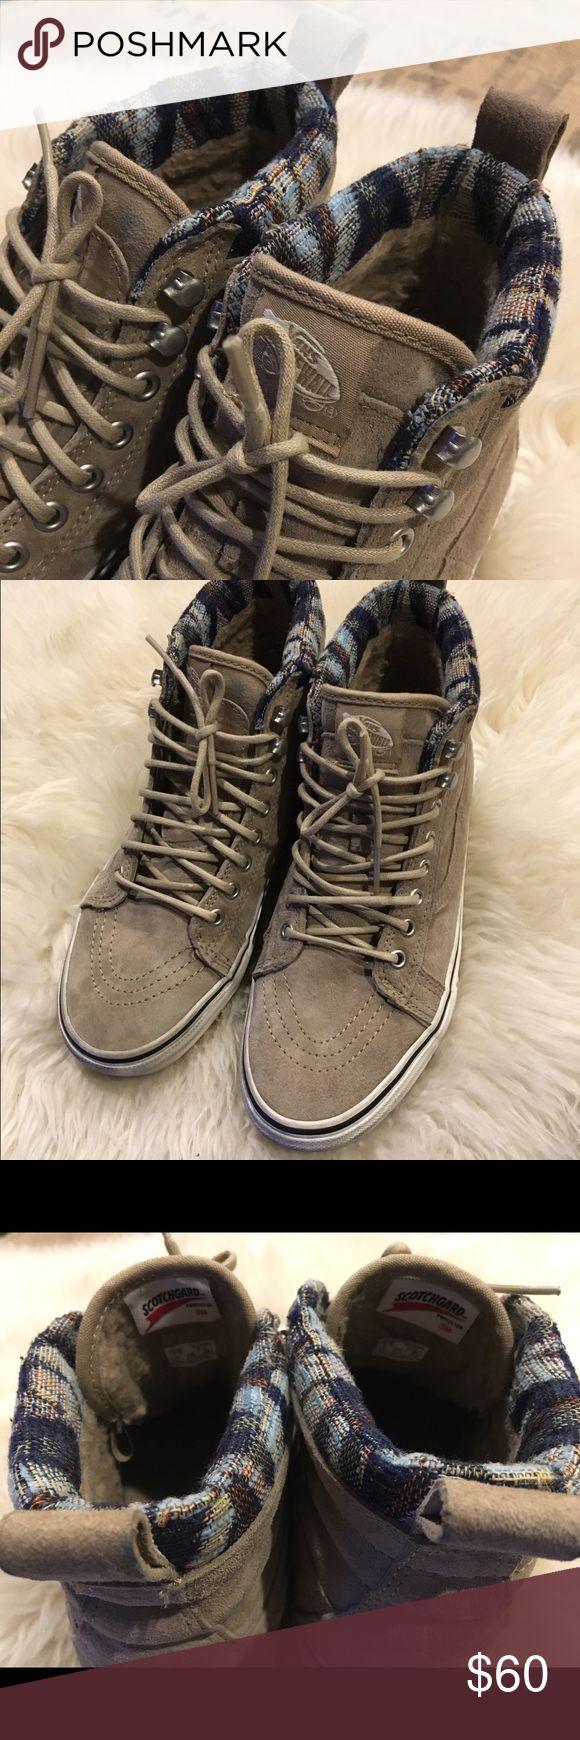 - SCOTCH GUARD SK8 HI VANS - - Weatherized - Rare Vans - Hi Top - Worn Twice- Like New - Vans Shoes Sneakers